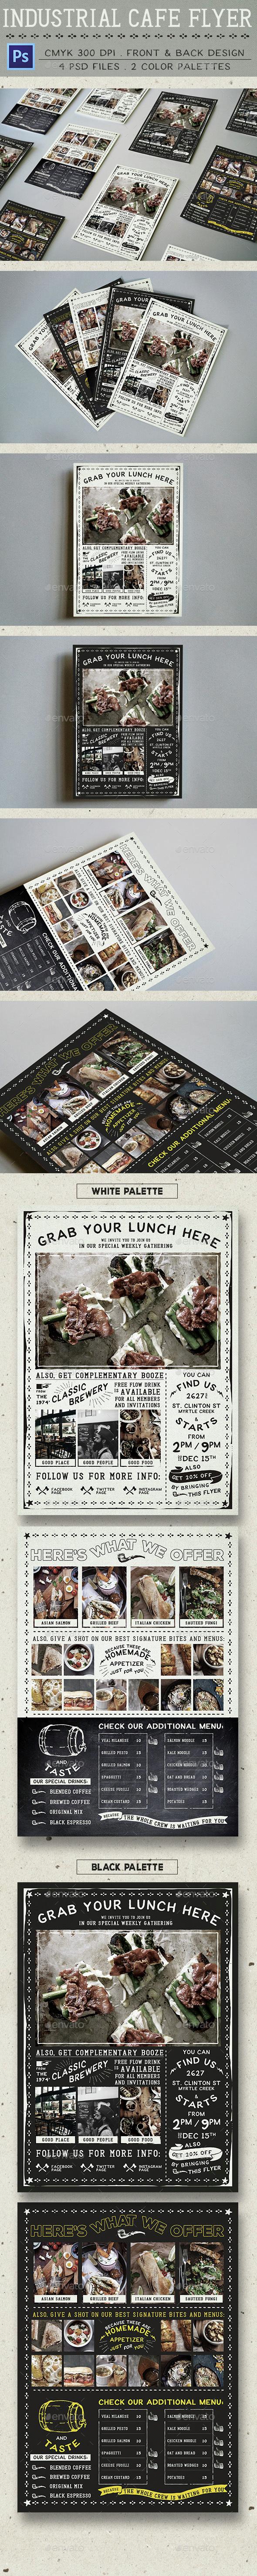 Industrial Cafe Flyer - Food Menus Print Templates